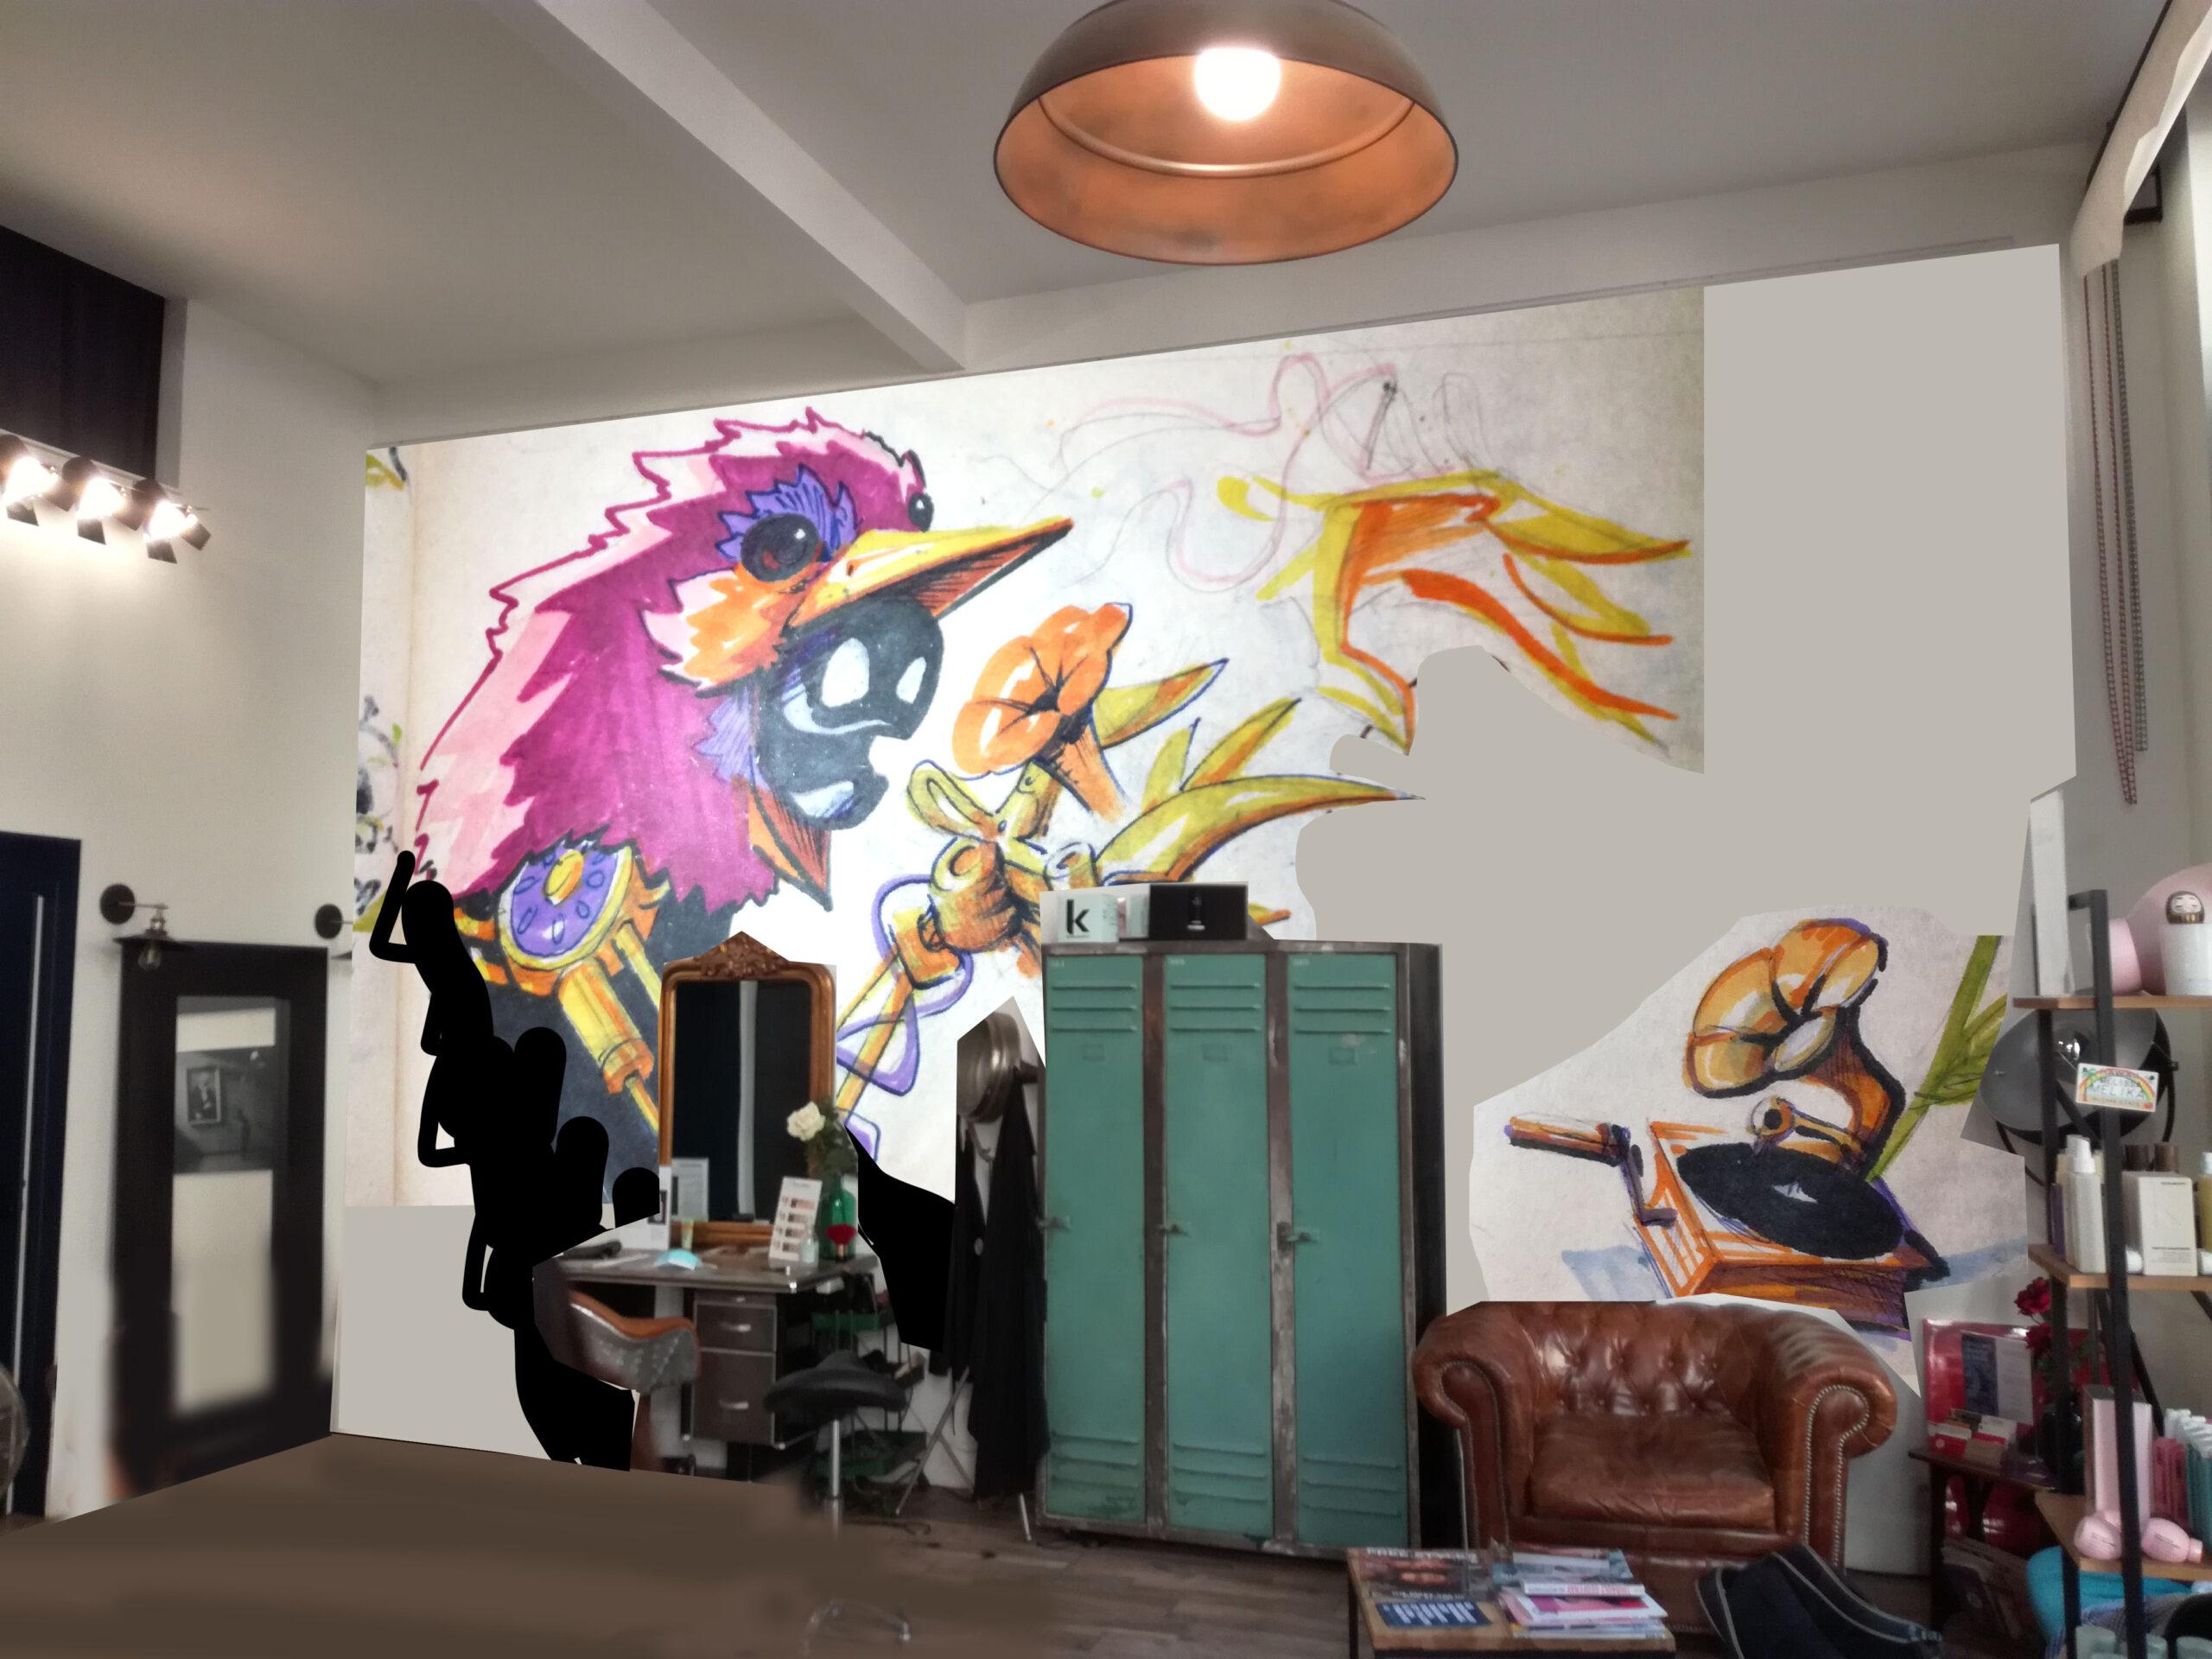 sution inside coiffure lyon - deco graffiti - streetart abys2fly